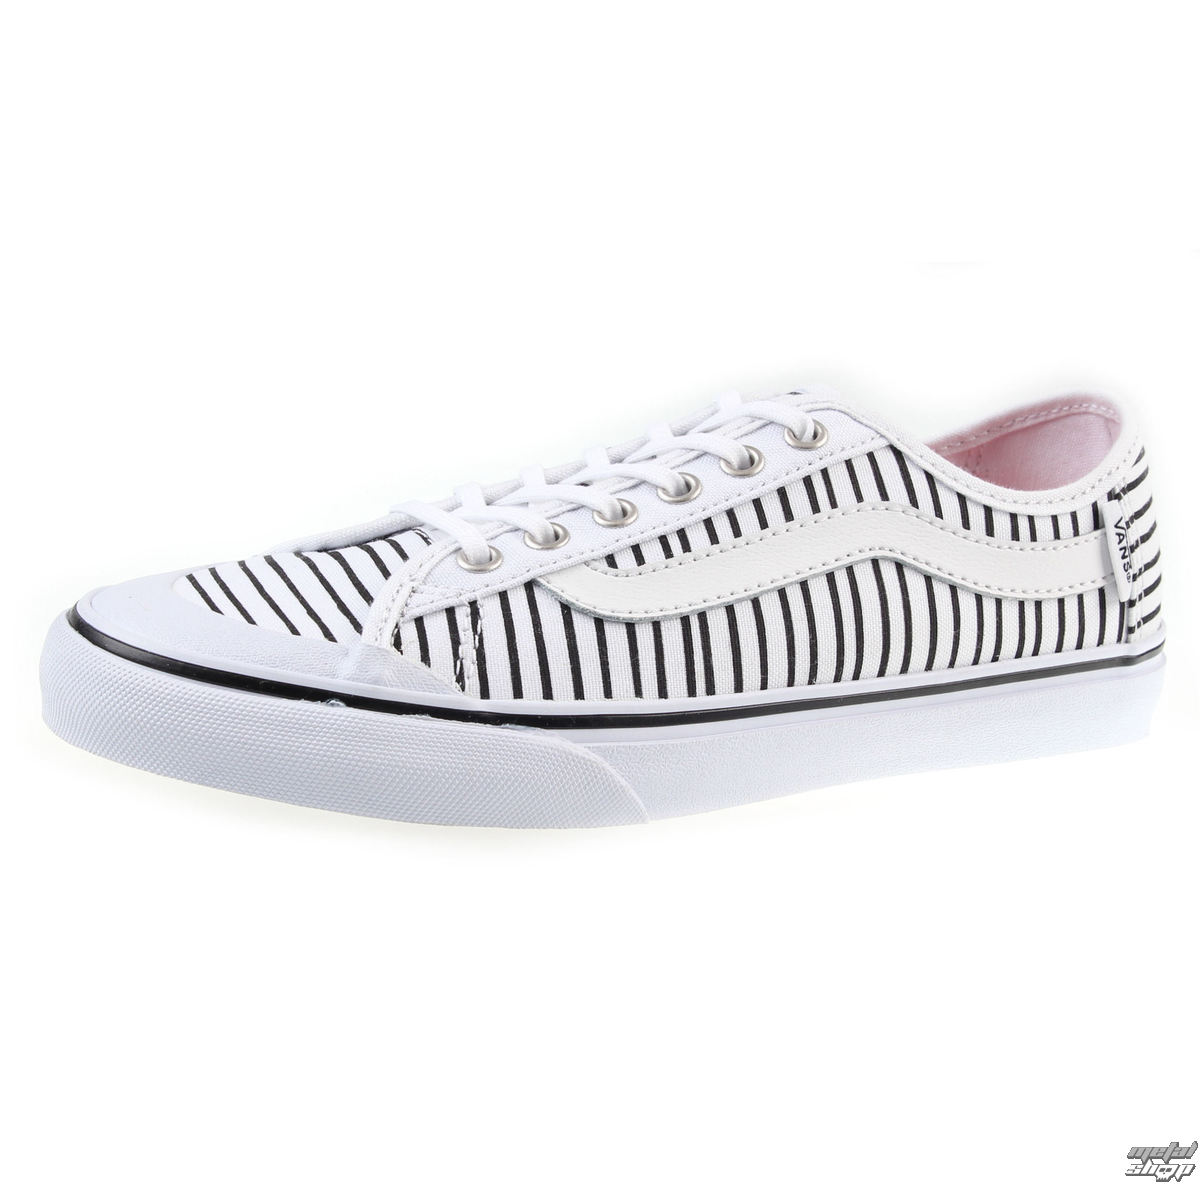 topánky dámske VANS - Black Guľa SF - Justr Stripes - V4LAIF8